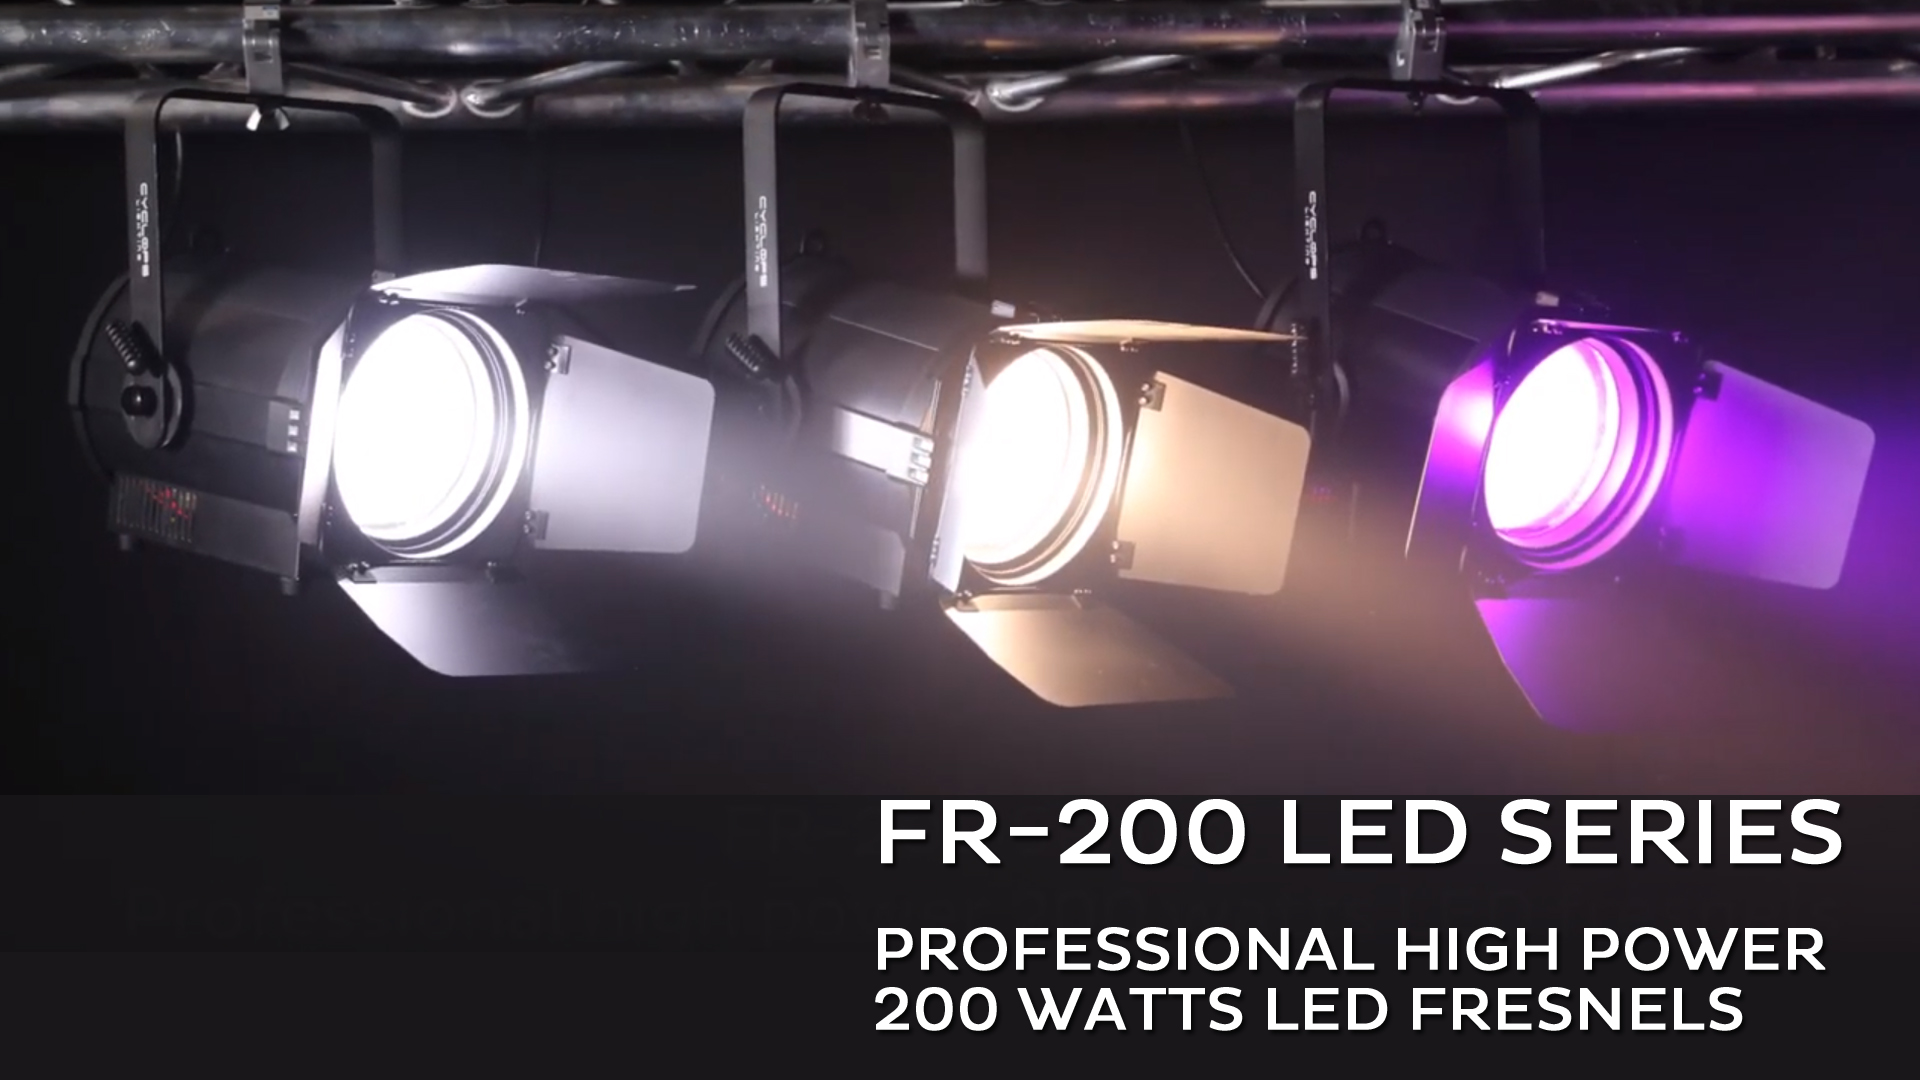 FR-200